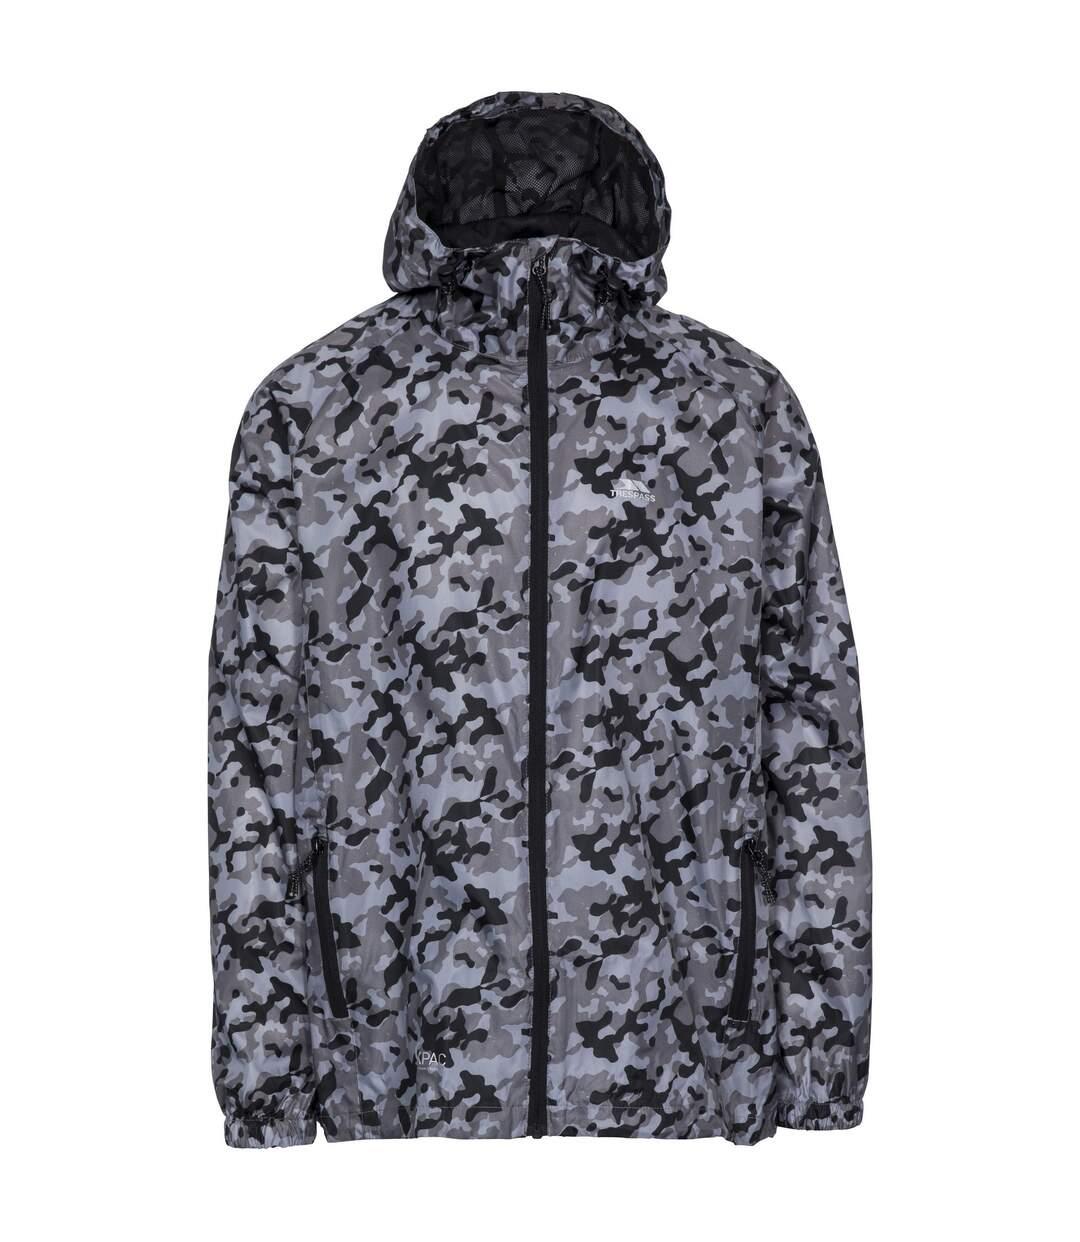 Trespass Qikpac Printed Packaway Waterproof Jacket (Grey Camo) - UTTP4324